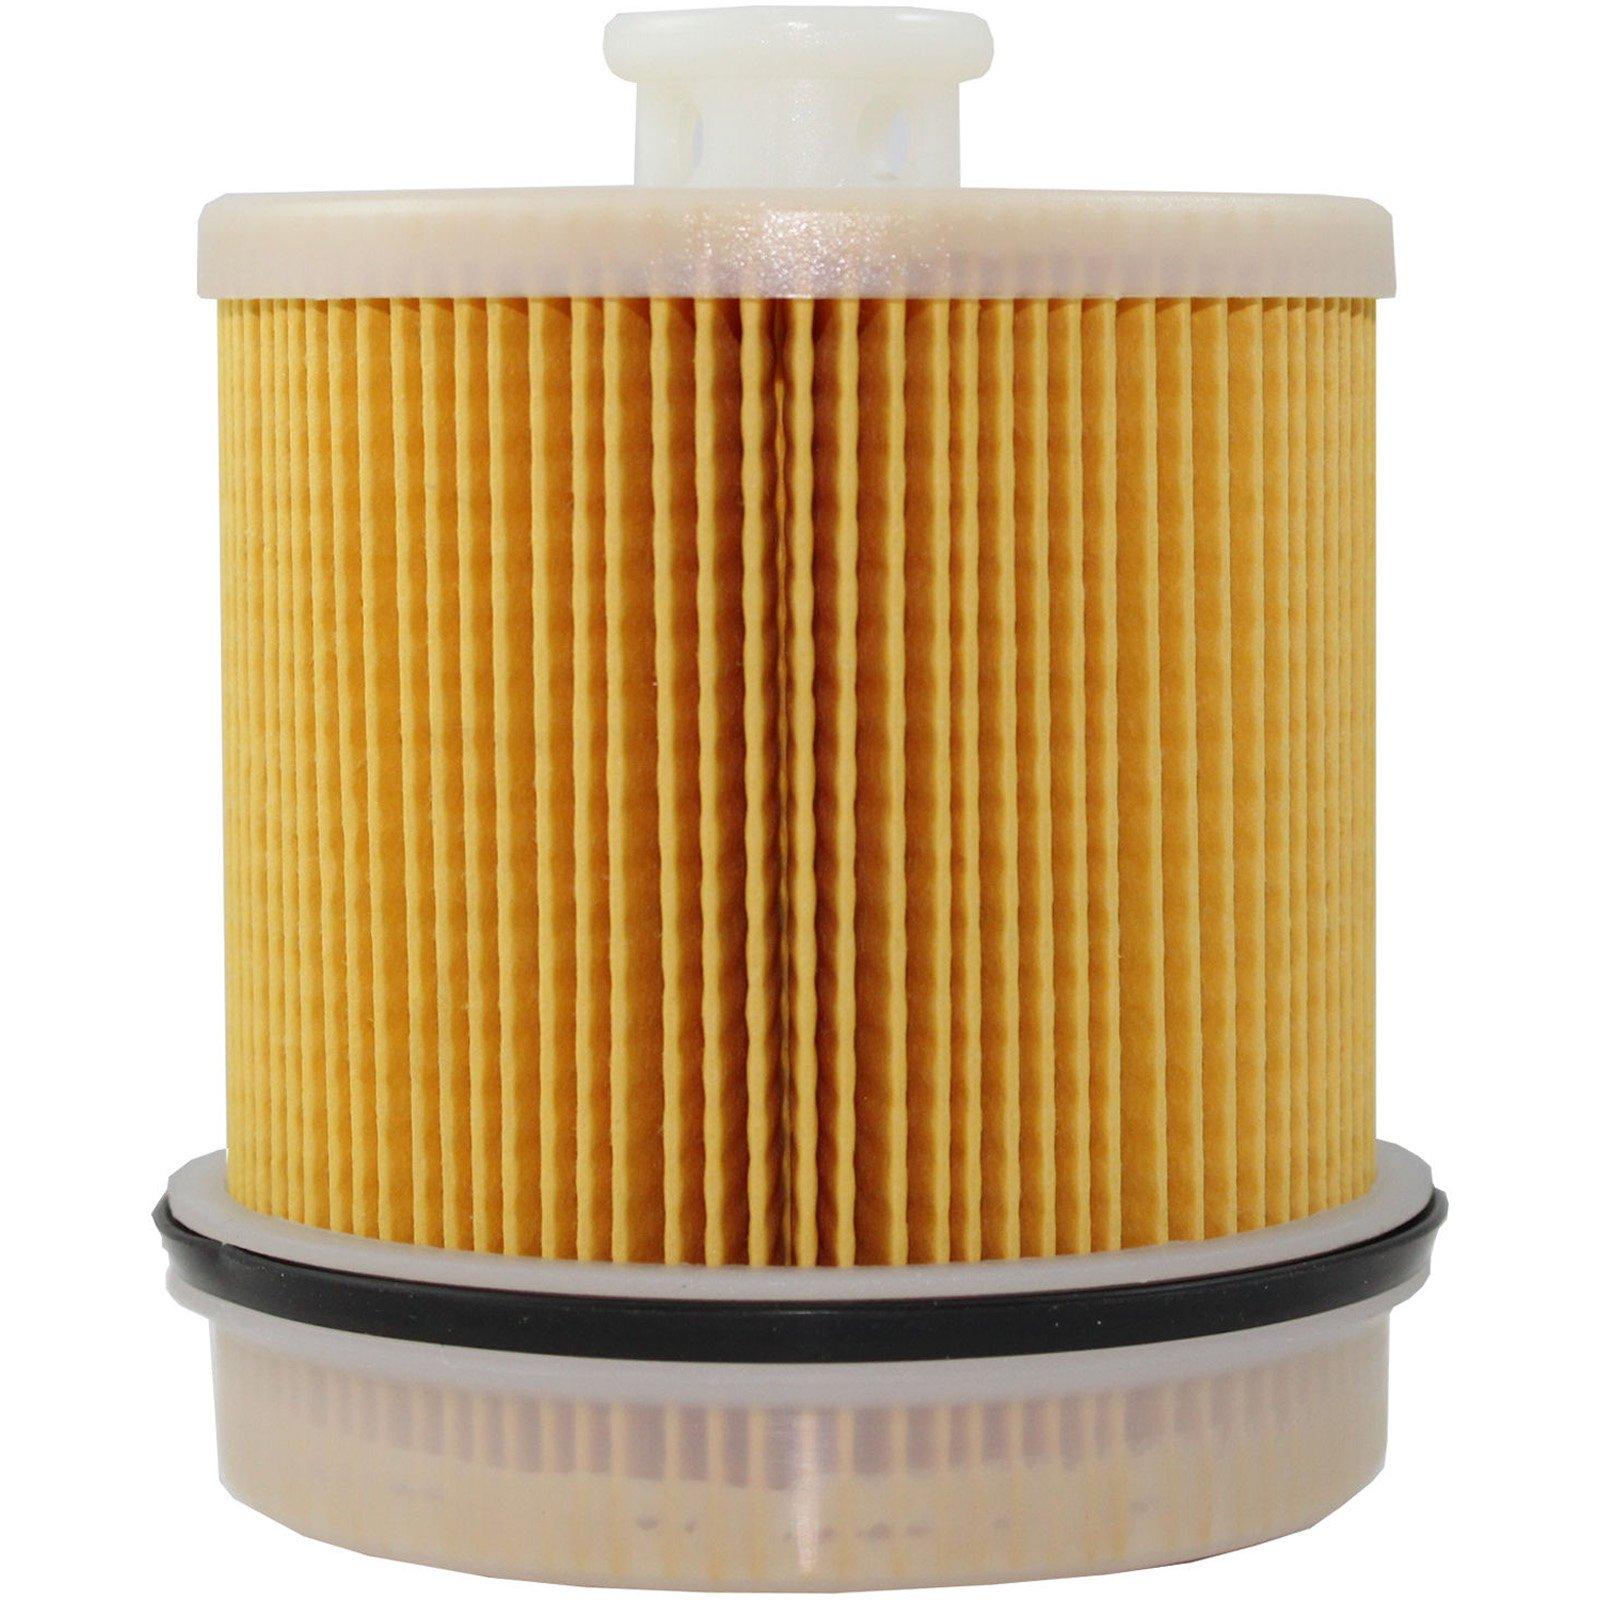 Luber-finer L2021F Heavy Duty Fuel Filter